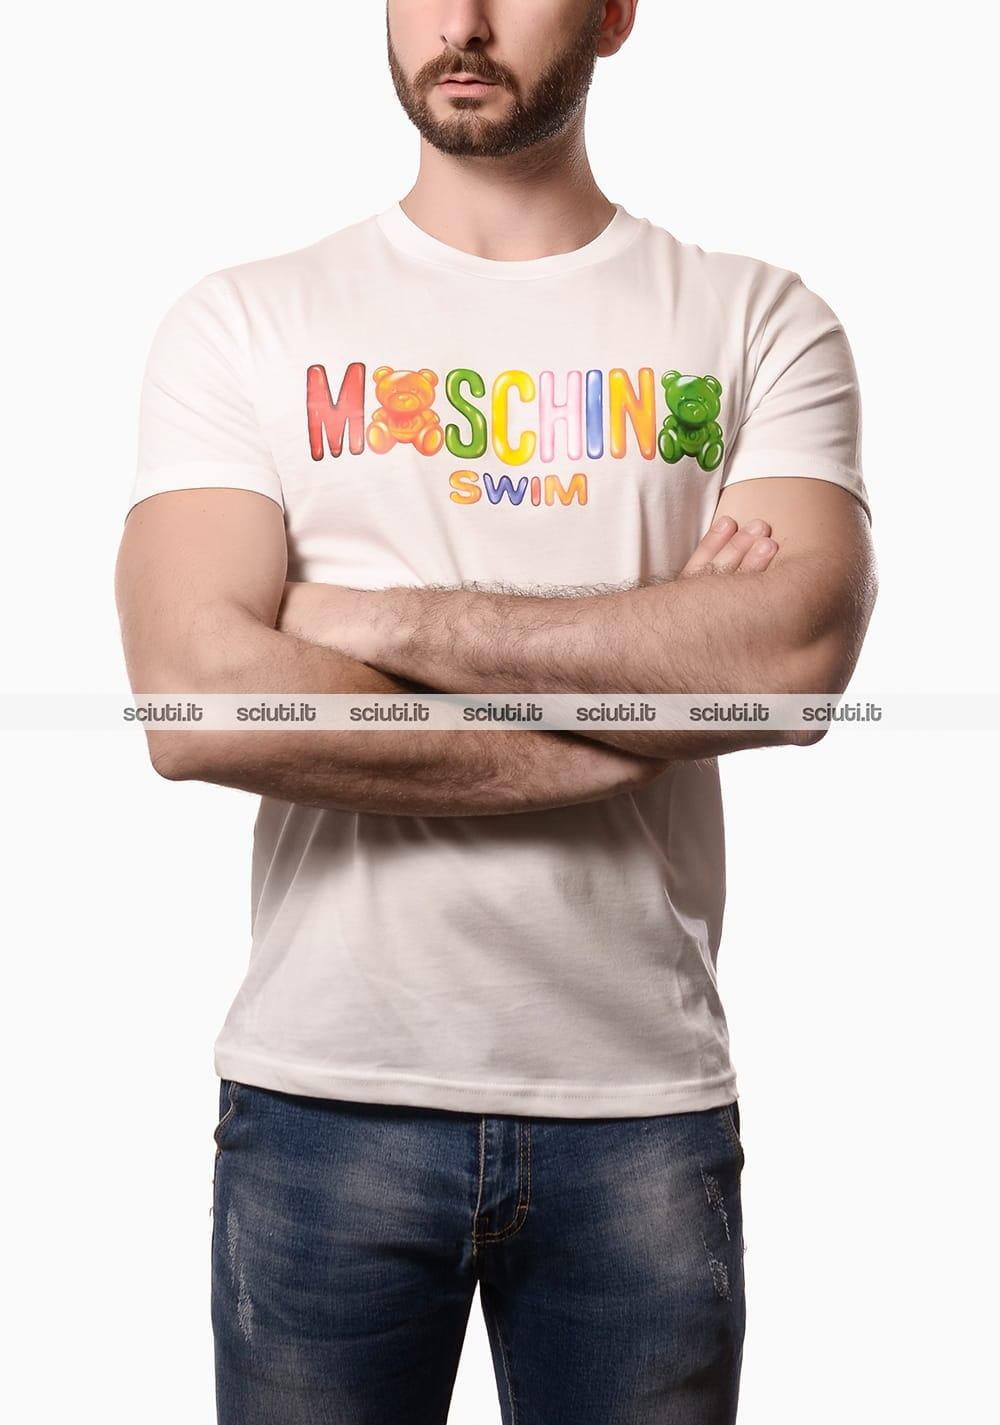 Tshirt Moschino Swim uomo logo gummy bear bianco | Sciuti.it